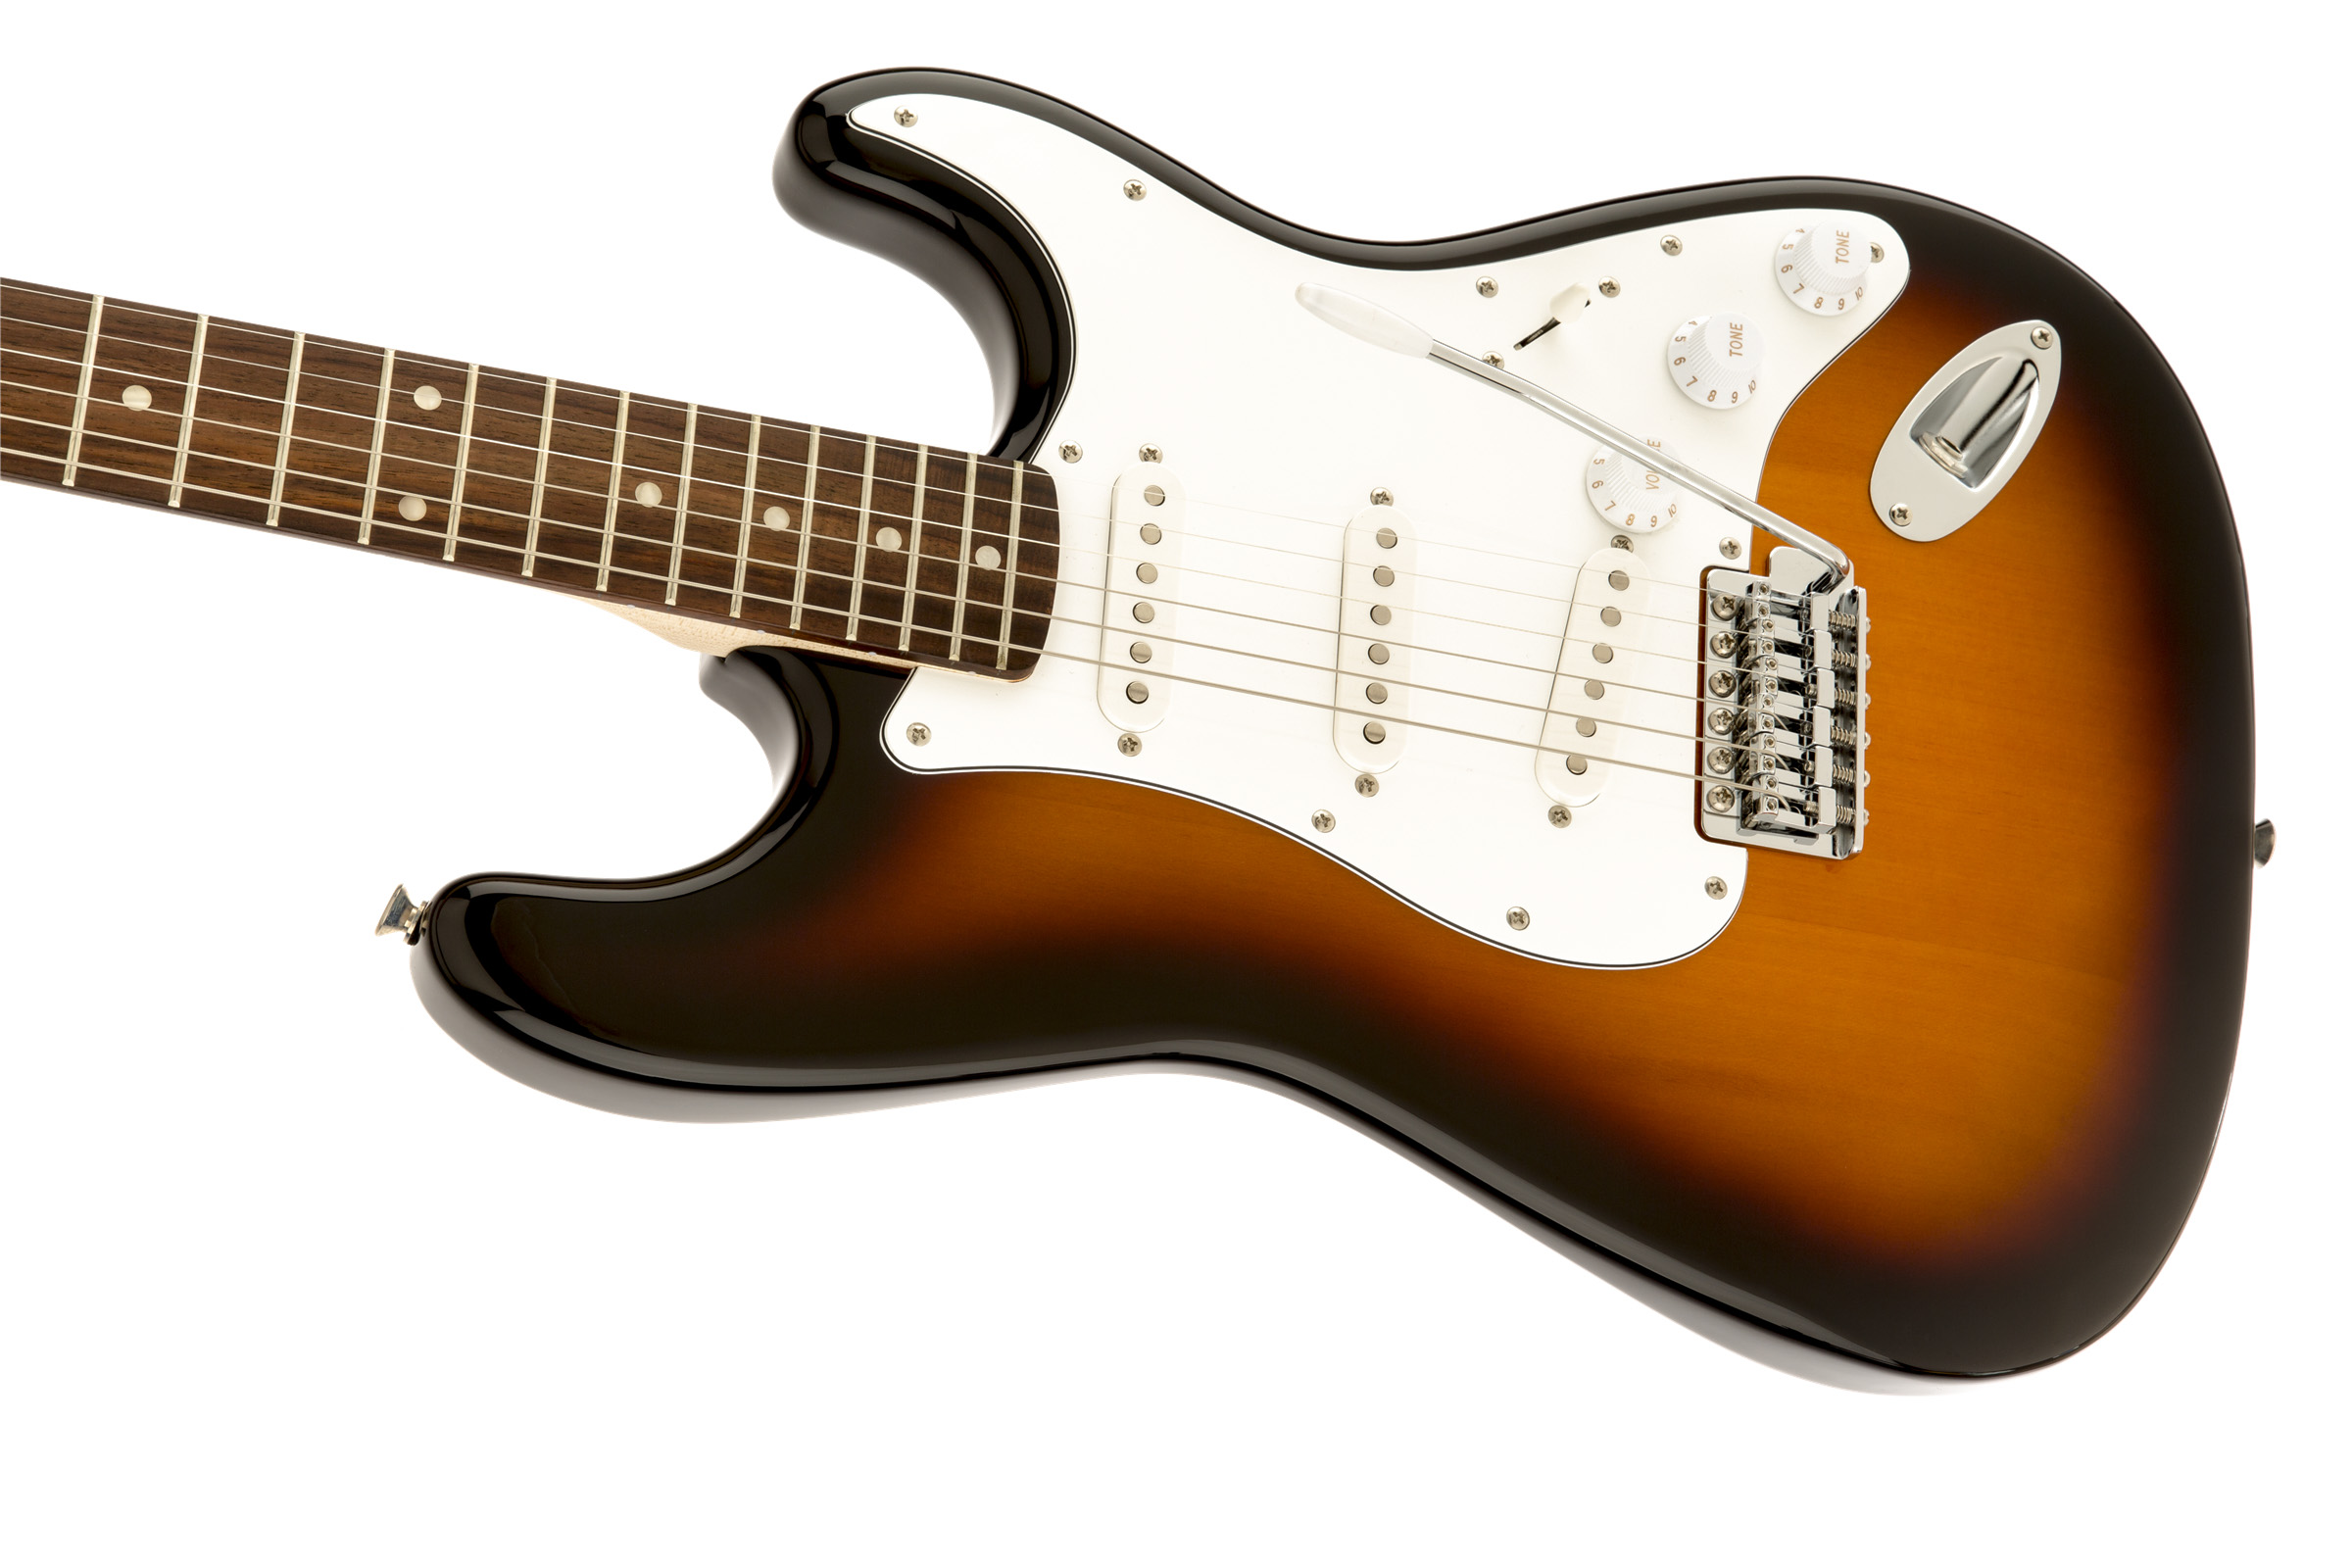 thumbnail 4 - Fender Squier Affinity Stratocaster - Brown Sunburst w/ Frontman 10G Amplifier